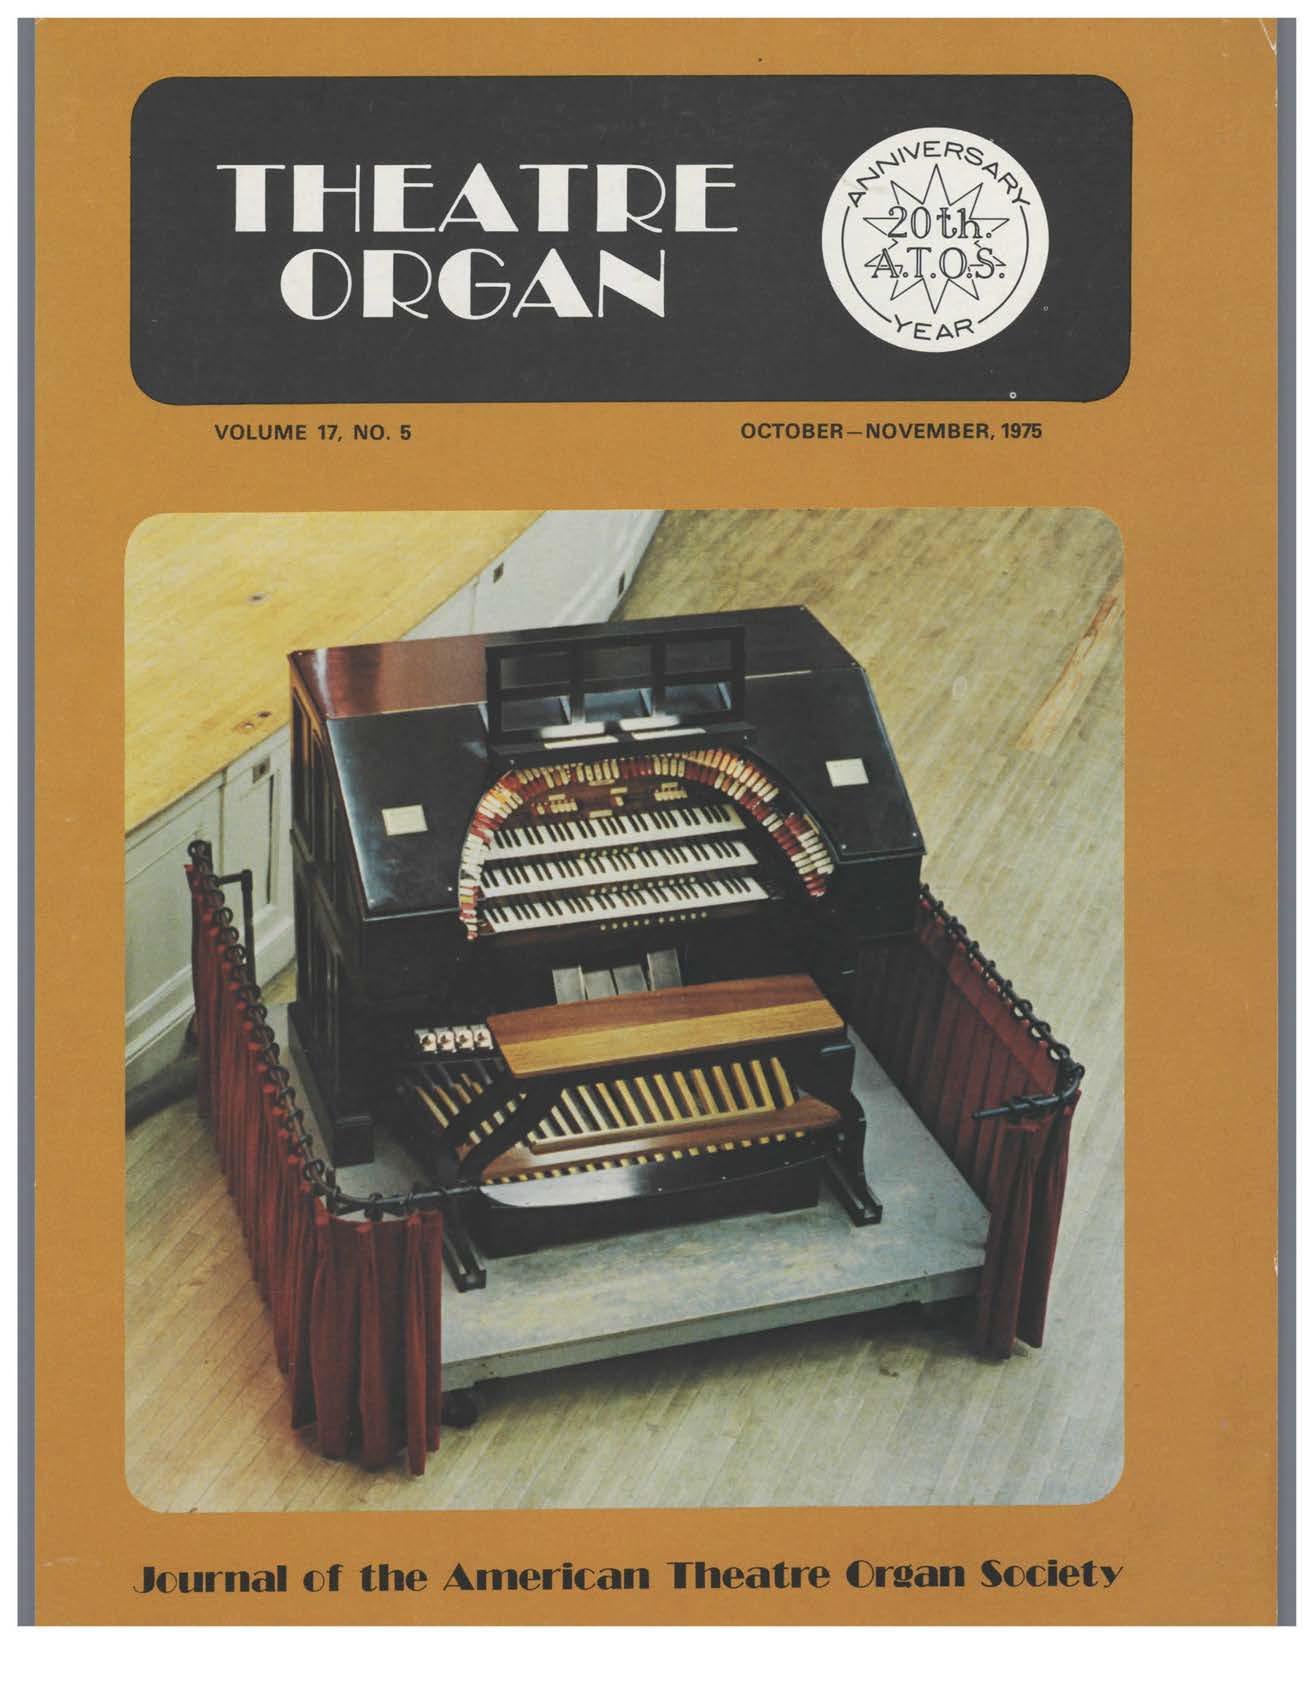 Theatre Organ, October - November 1975, Volume 17, Number 5